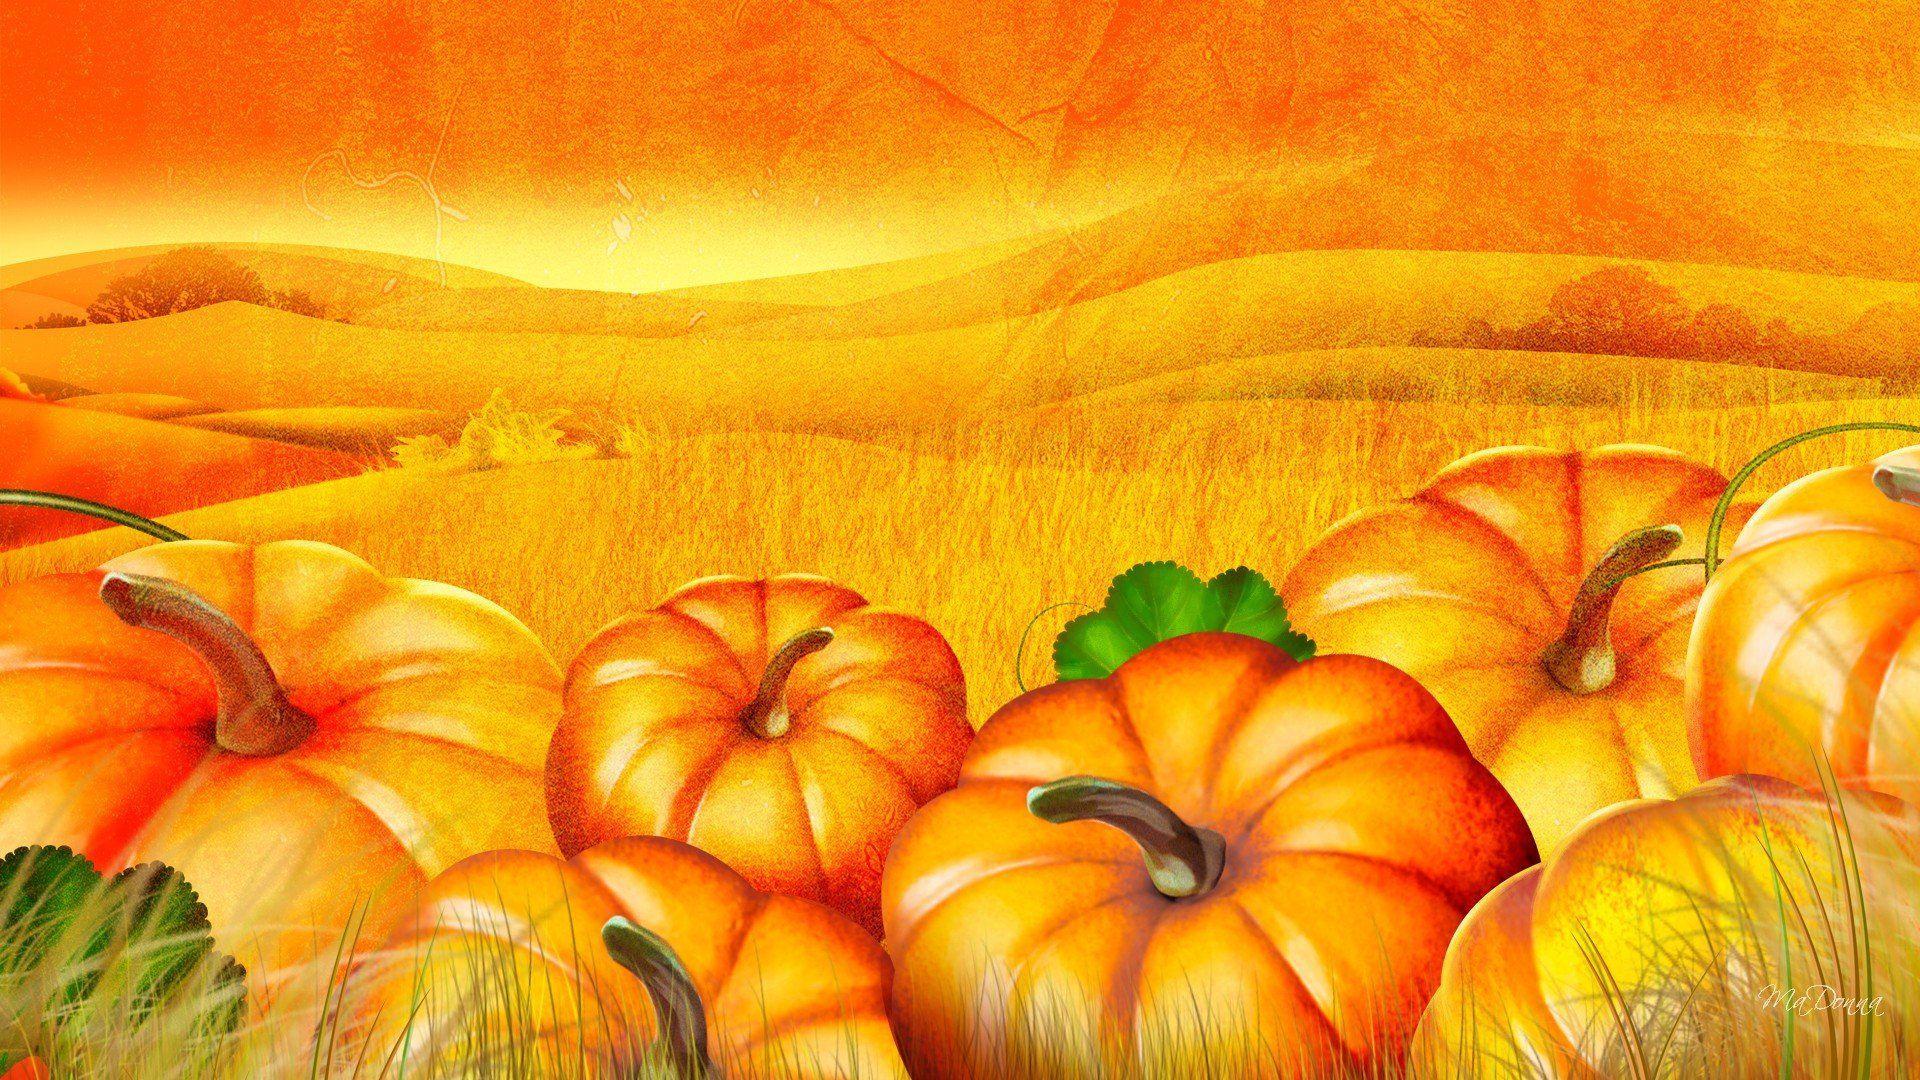 Pumpkin Patch Wallpapers - Wallpaper Cave